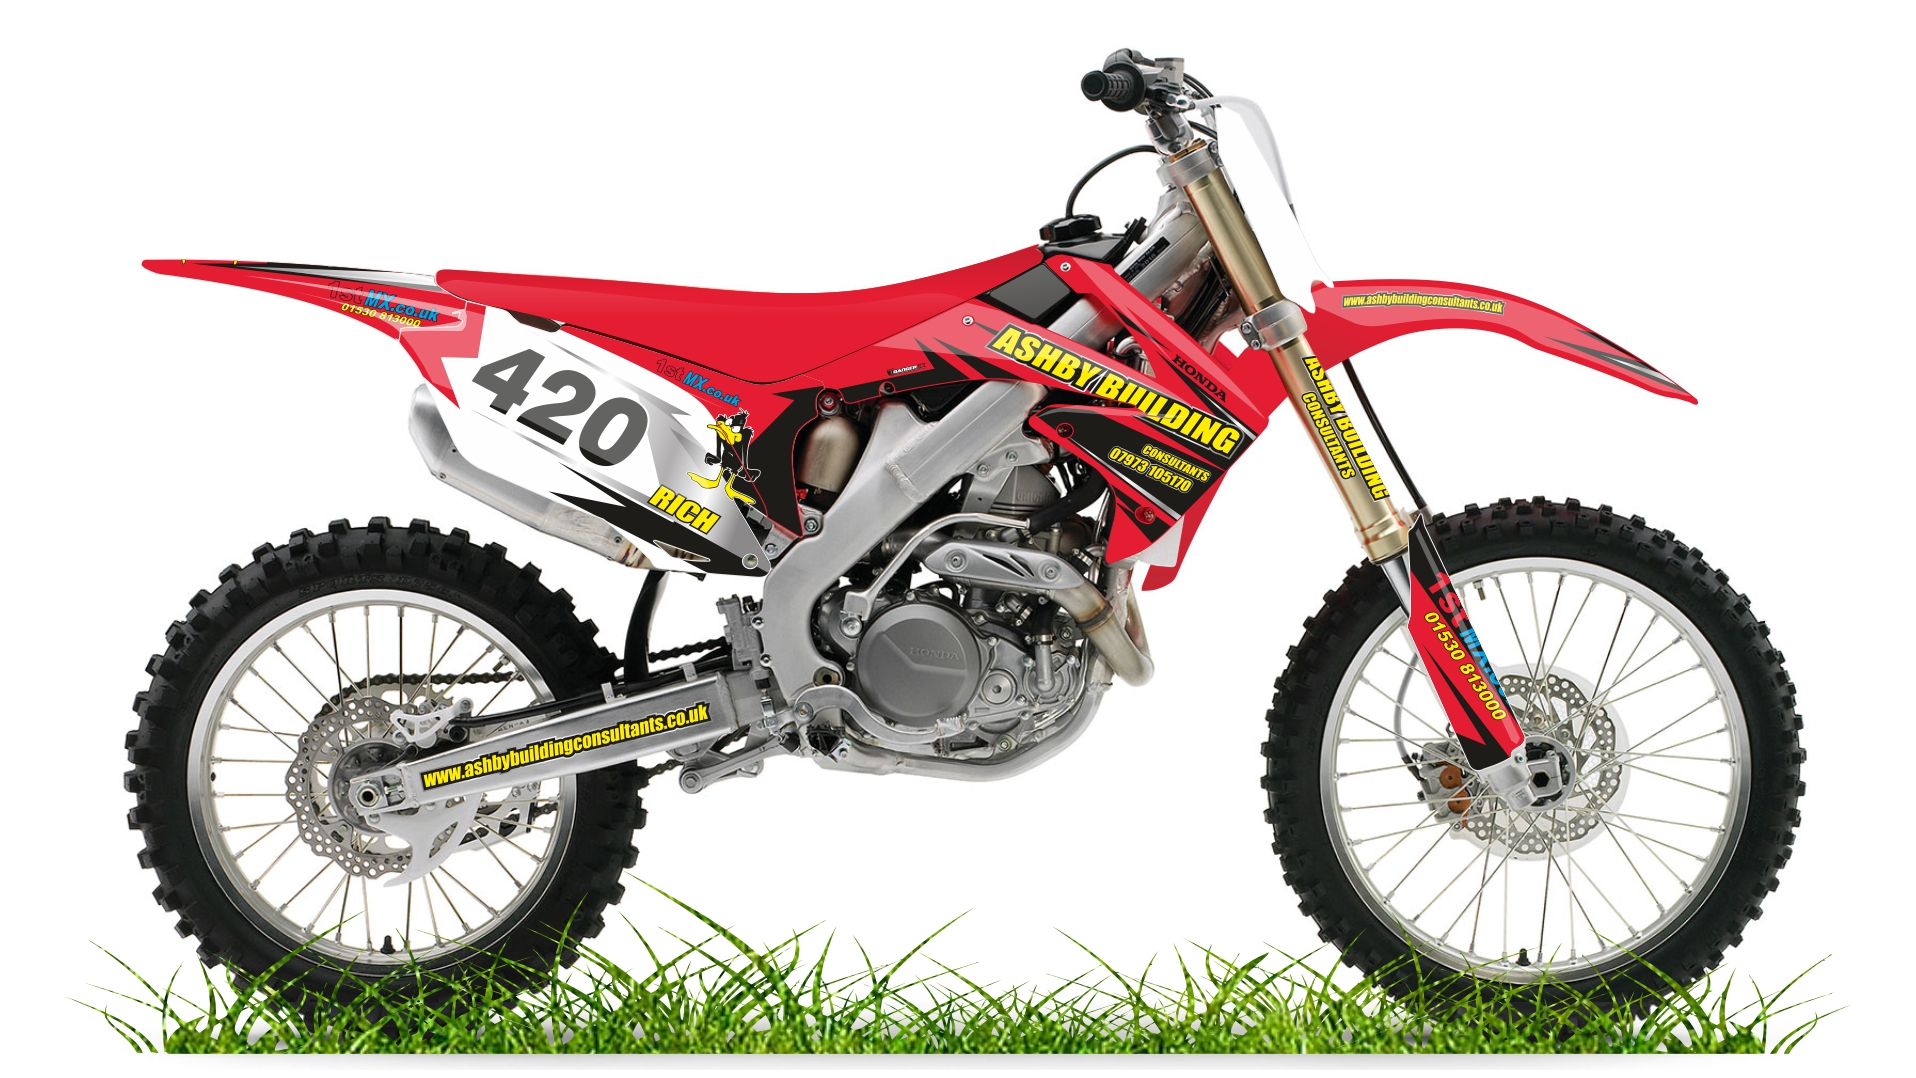 Custom bike 420 ashby